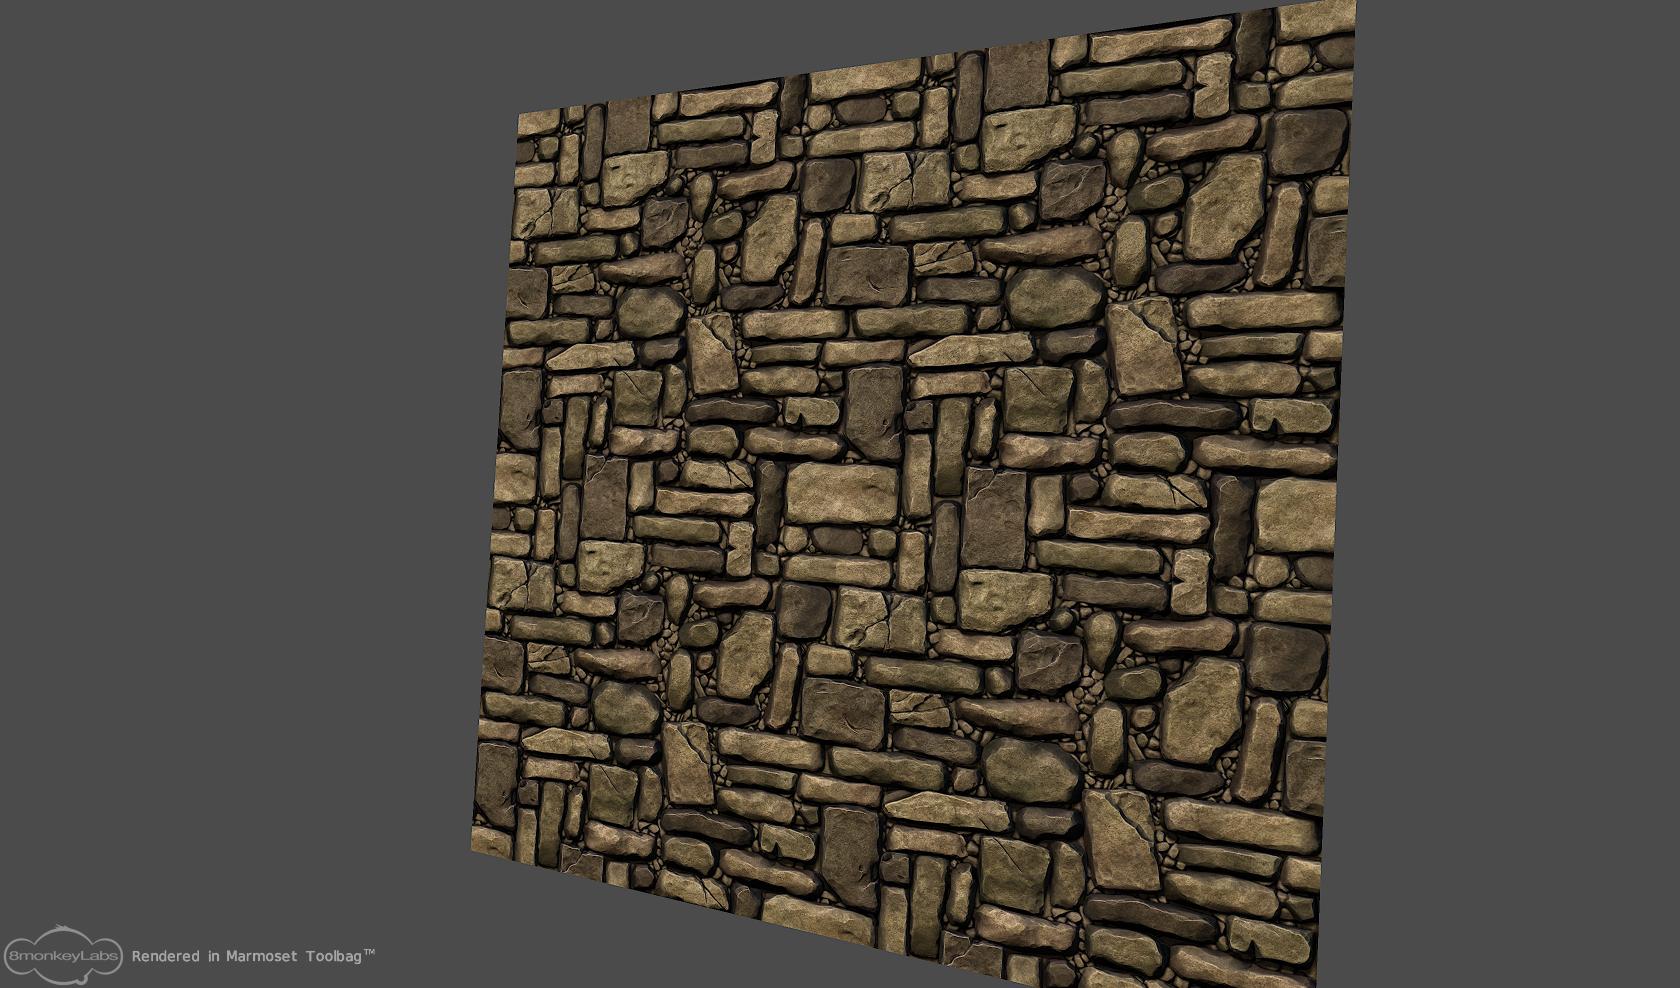 20120803_brick_wall_01_2x2.jpg